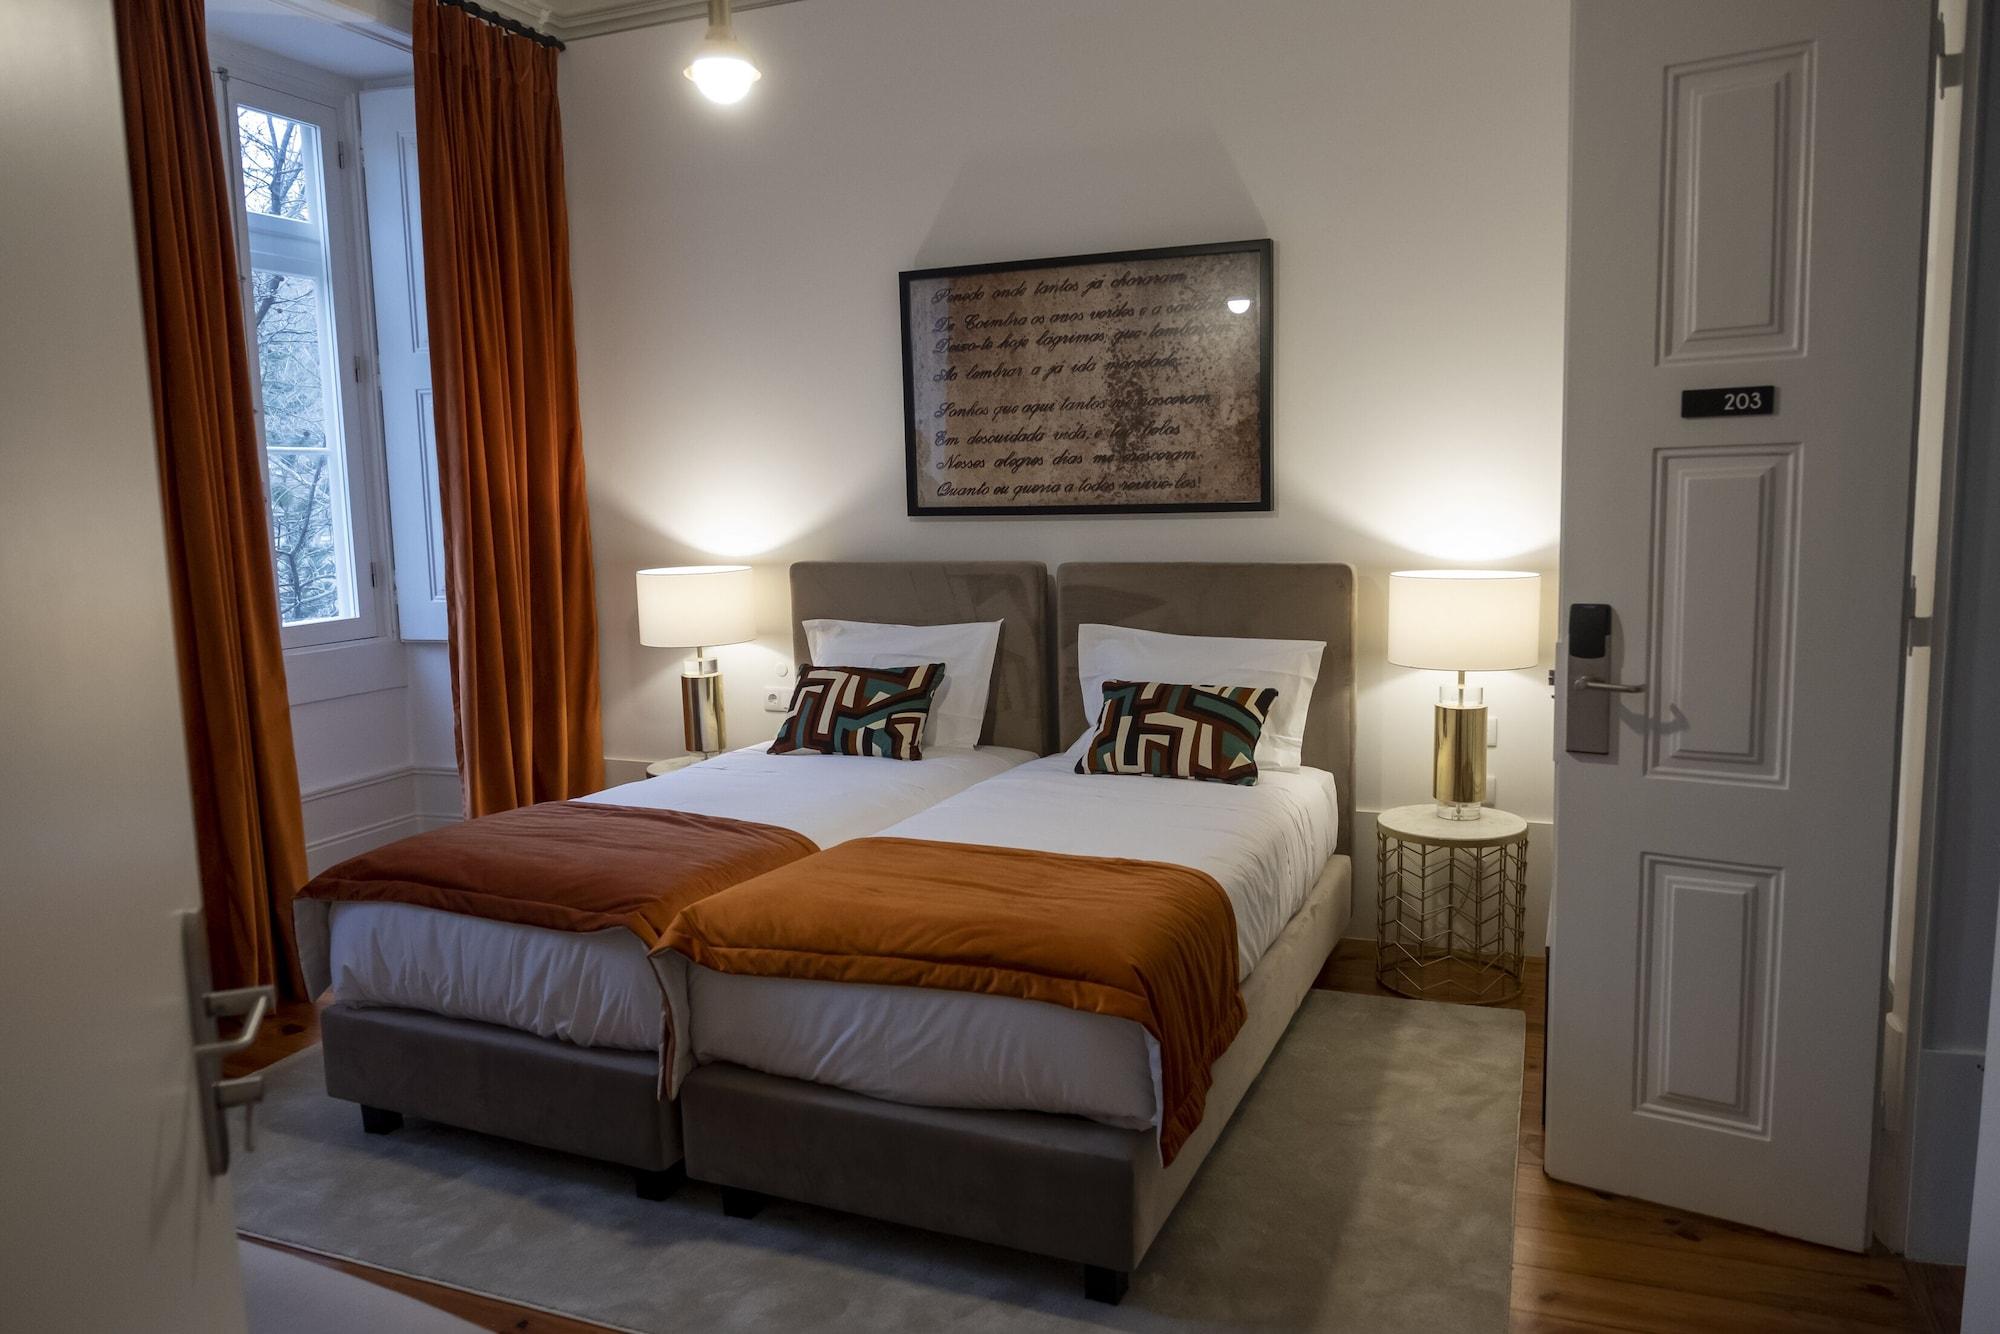 Top Coimbra - Amazing Stays, Coimbra